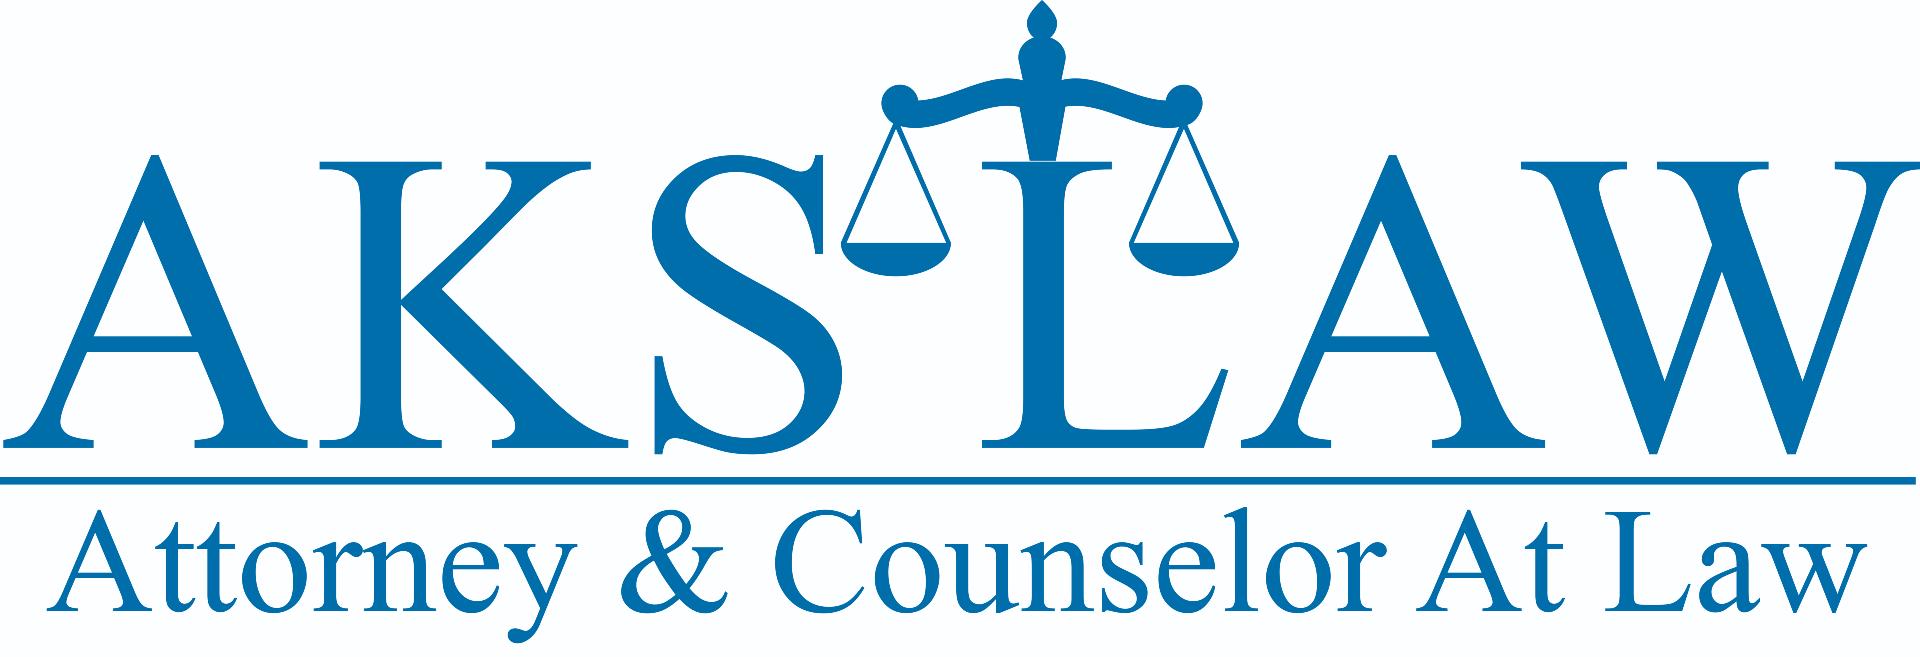 AKS Law Firm Logo